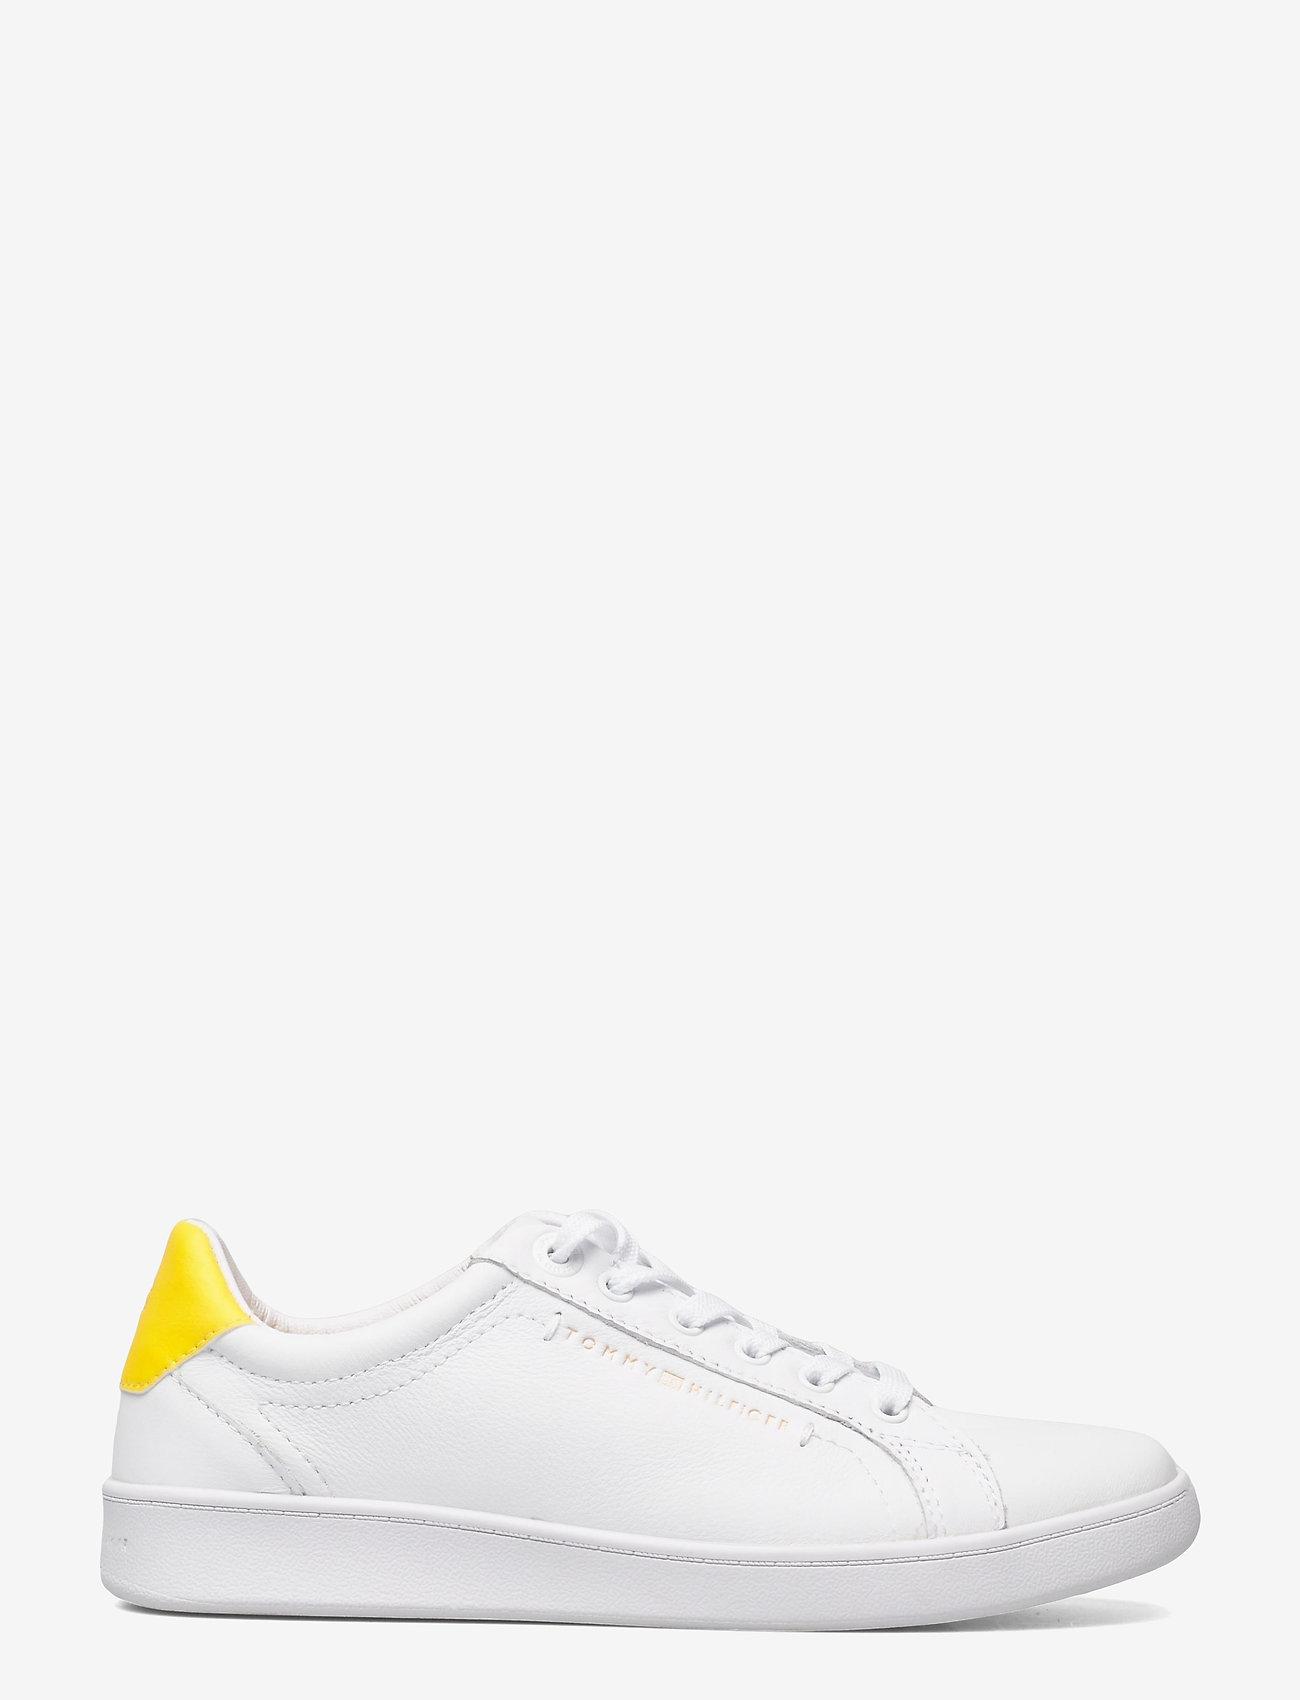 Tommy Hilfiger - PREMIUM COURT SNEAKER - low top sneakers - vivid yellow - 1